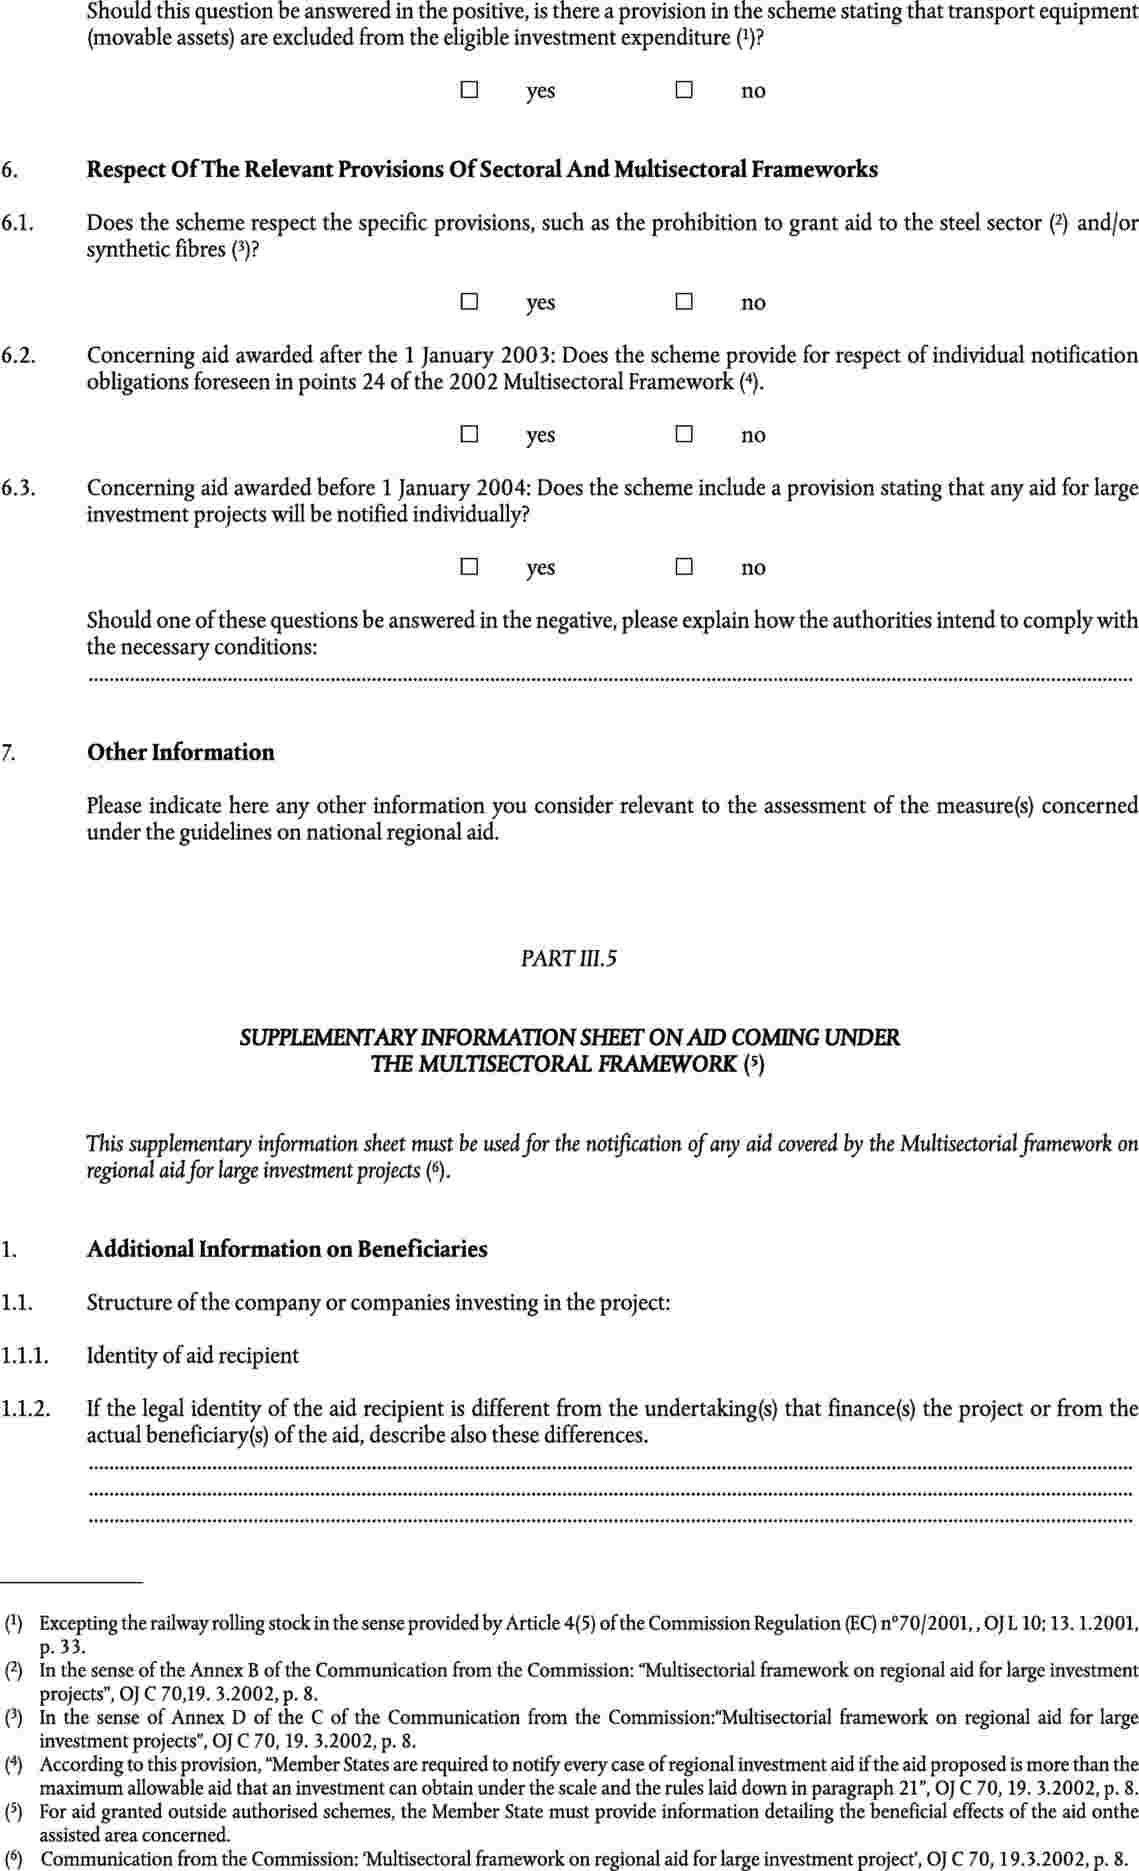 Advanced Physics Unit 6 Worksheet 3 Forces  Briefencounters Regarding Advanced Physics Unit 6 Worksheet 3 Forces